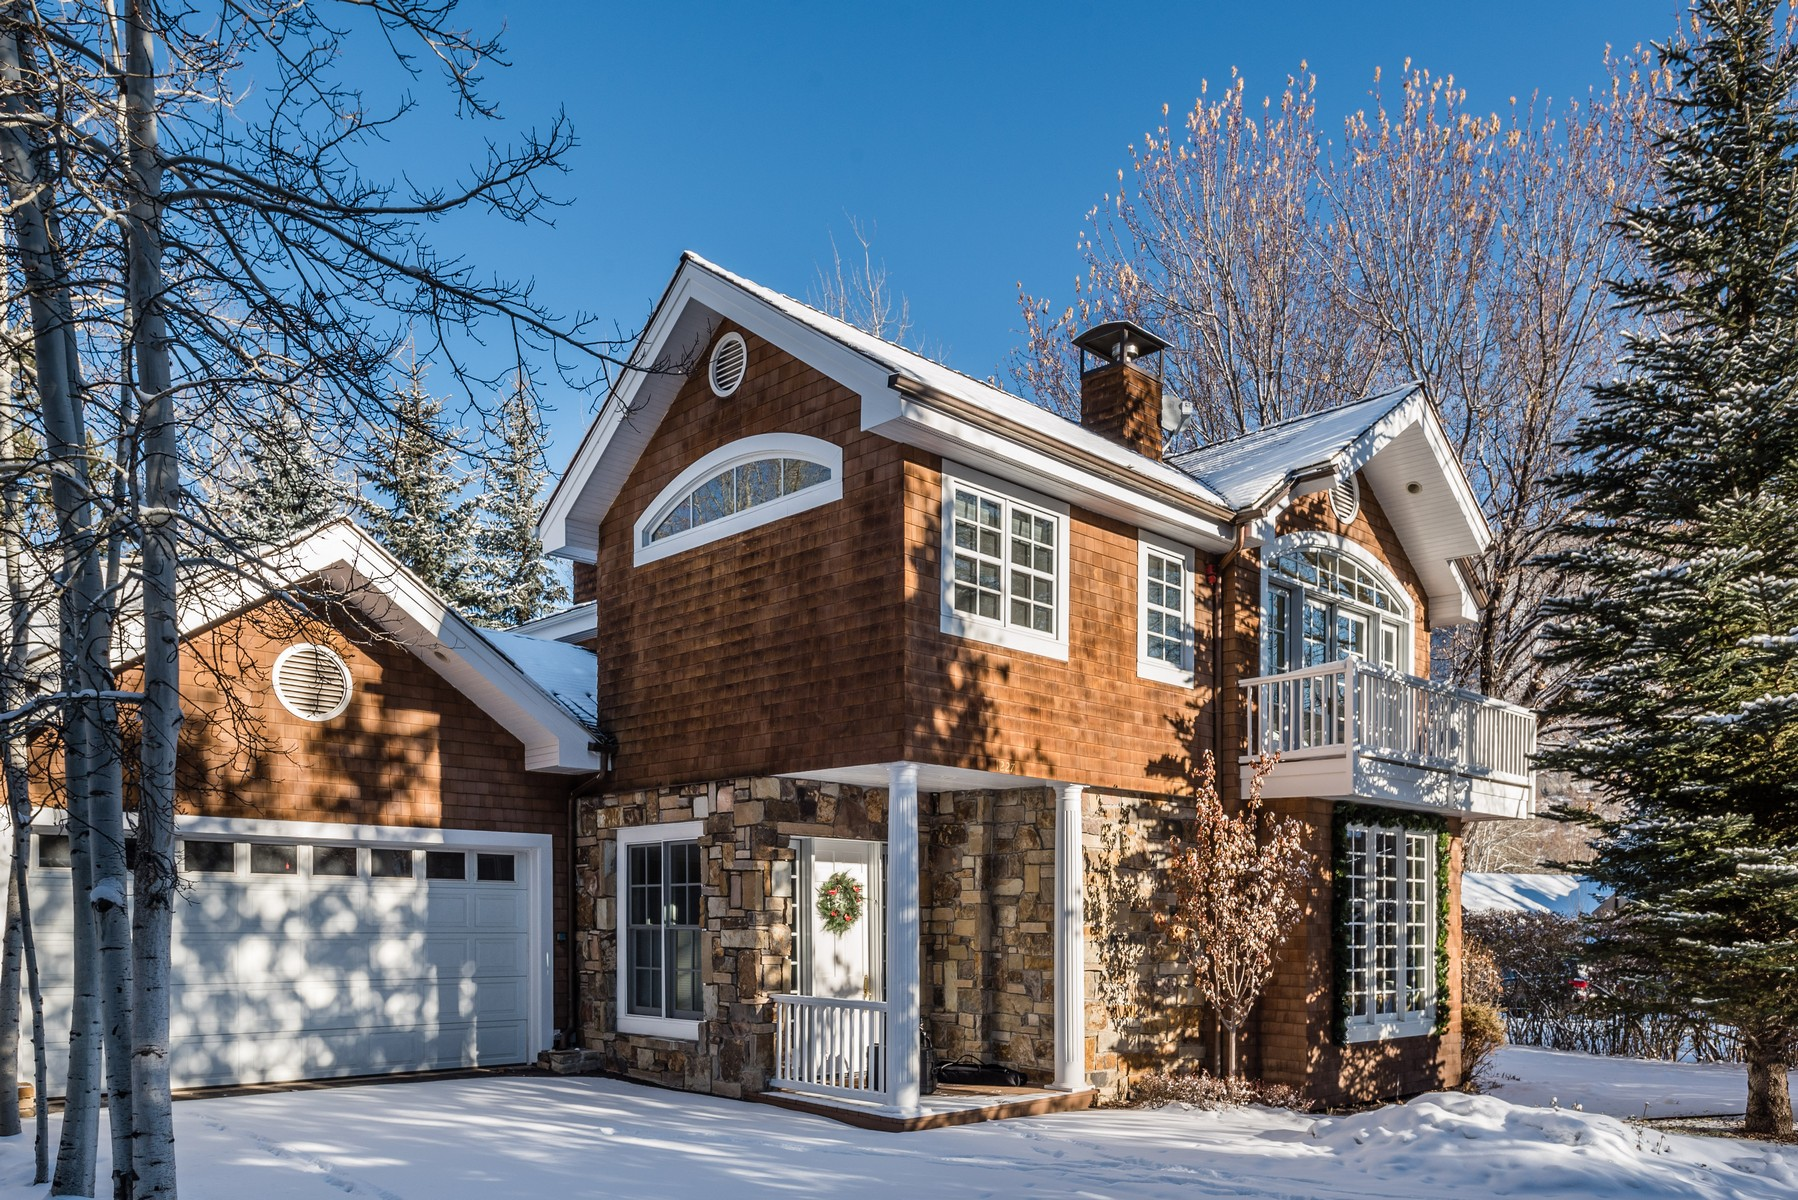 Duplex for Sale at Light & Bright on Snowbunny Lane 1227 Snowbunny Lane Aspen, Colorado 81611 United States